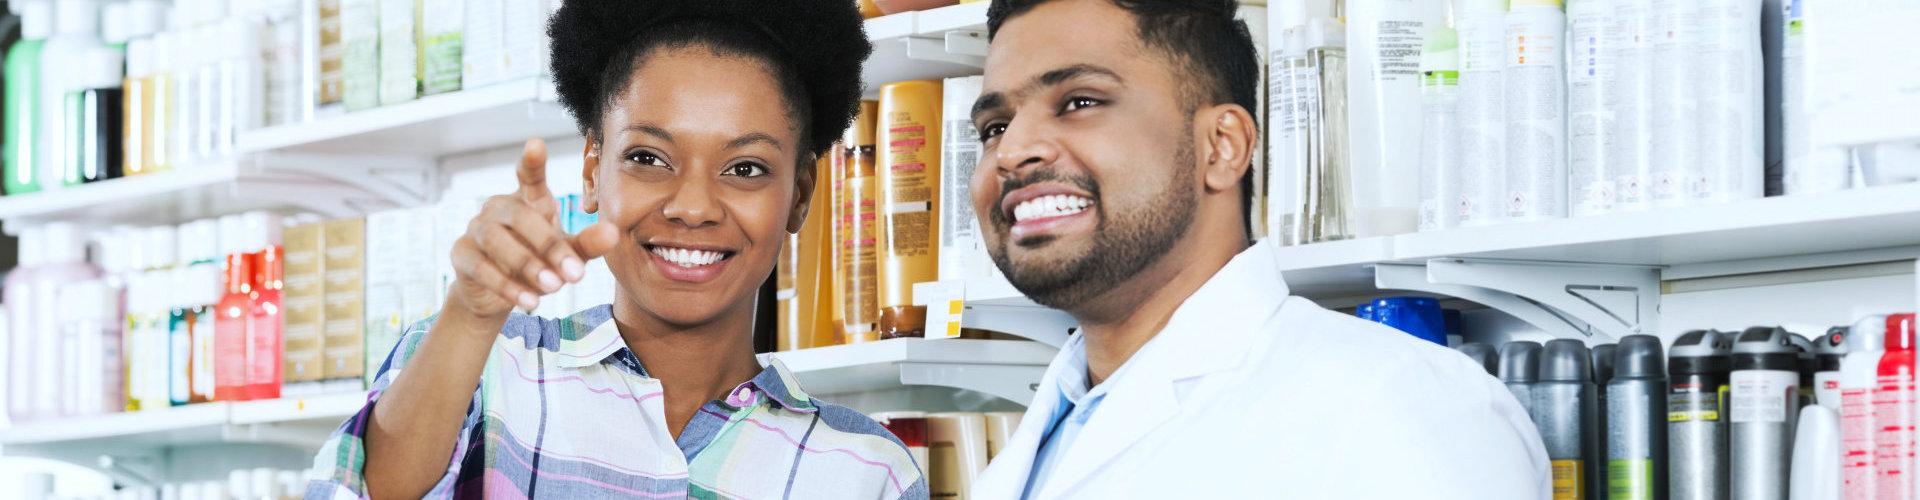 customer talking to a pharmacist